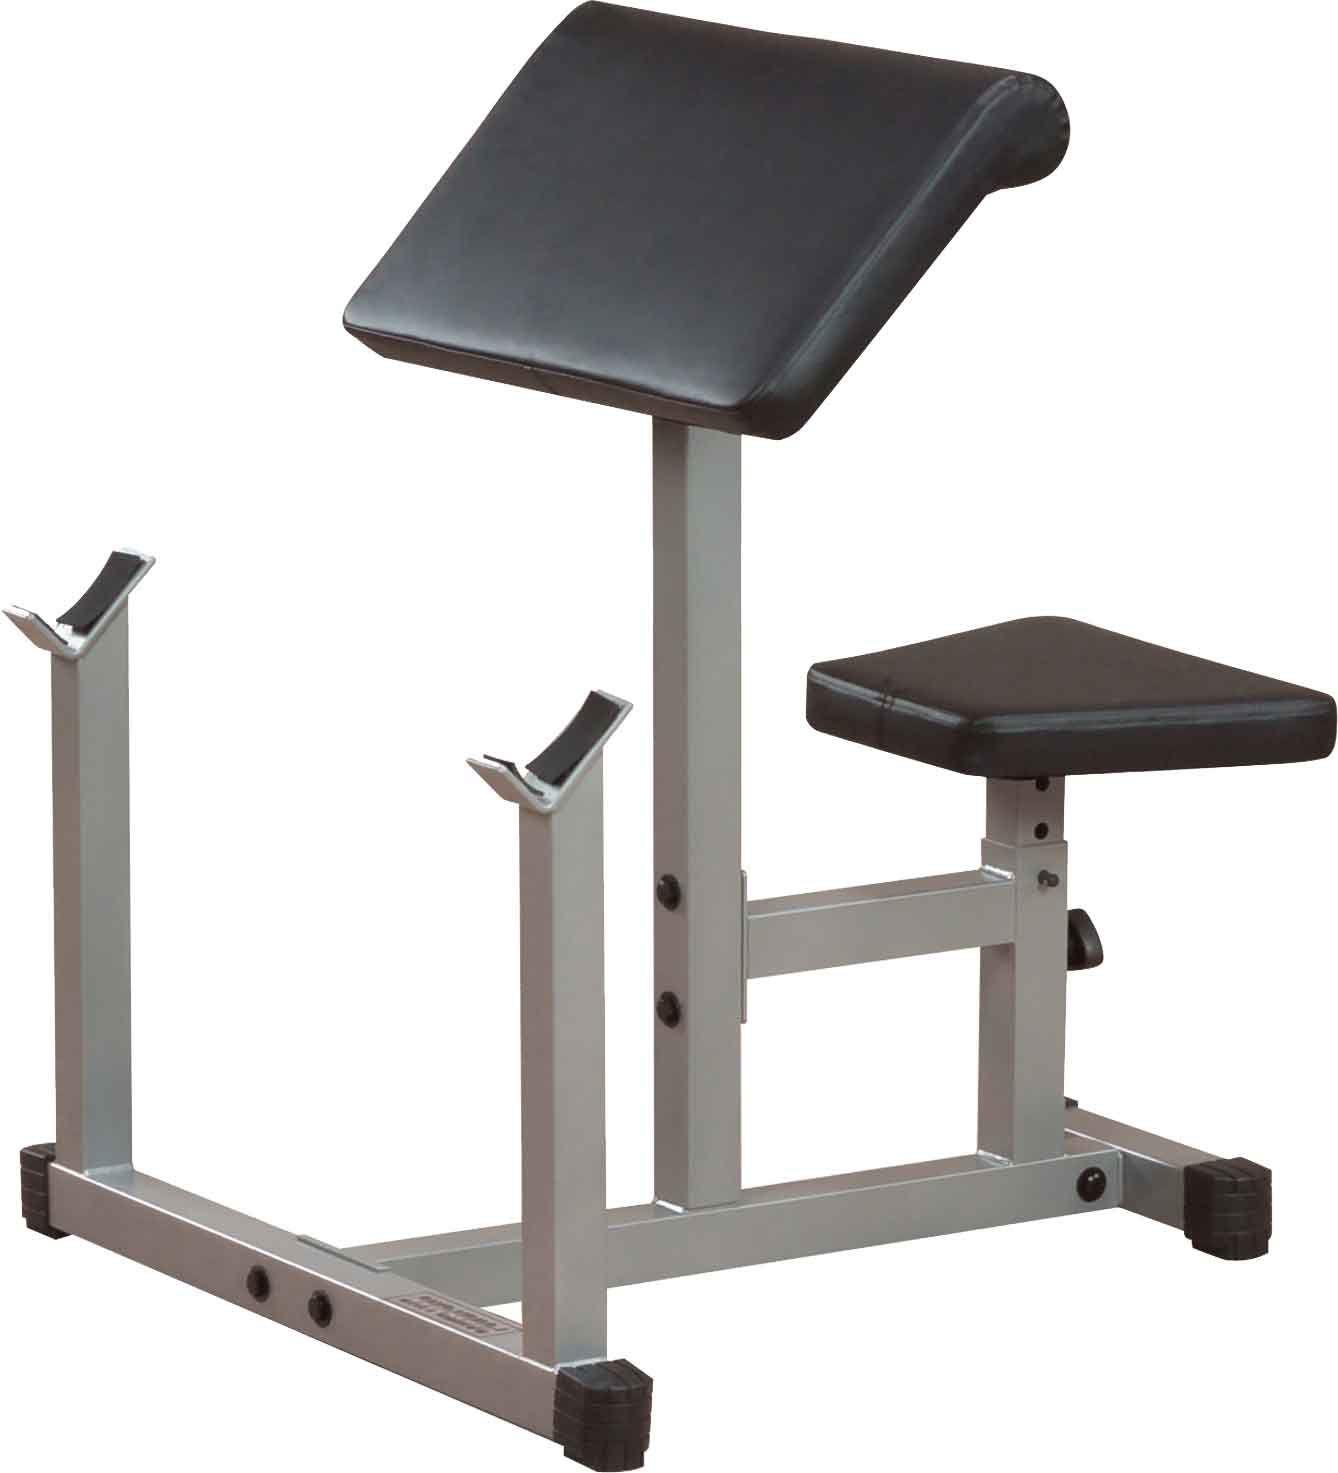 powerline ppb32x preacher curl weight bench | dick's sporting goods